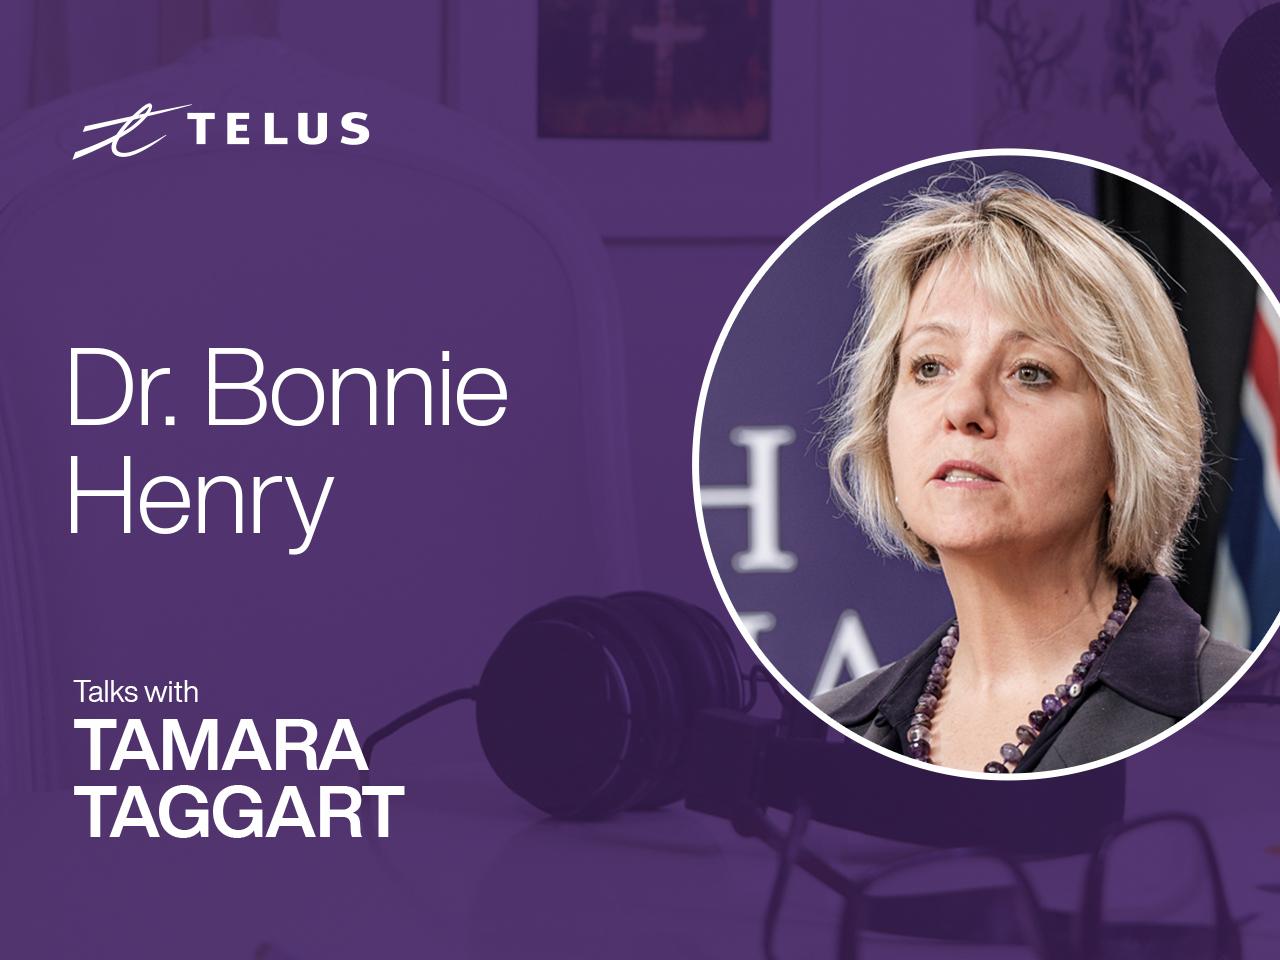 B.C. Provincial Health Officer, Dr. Bonnie Henry